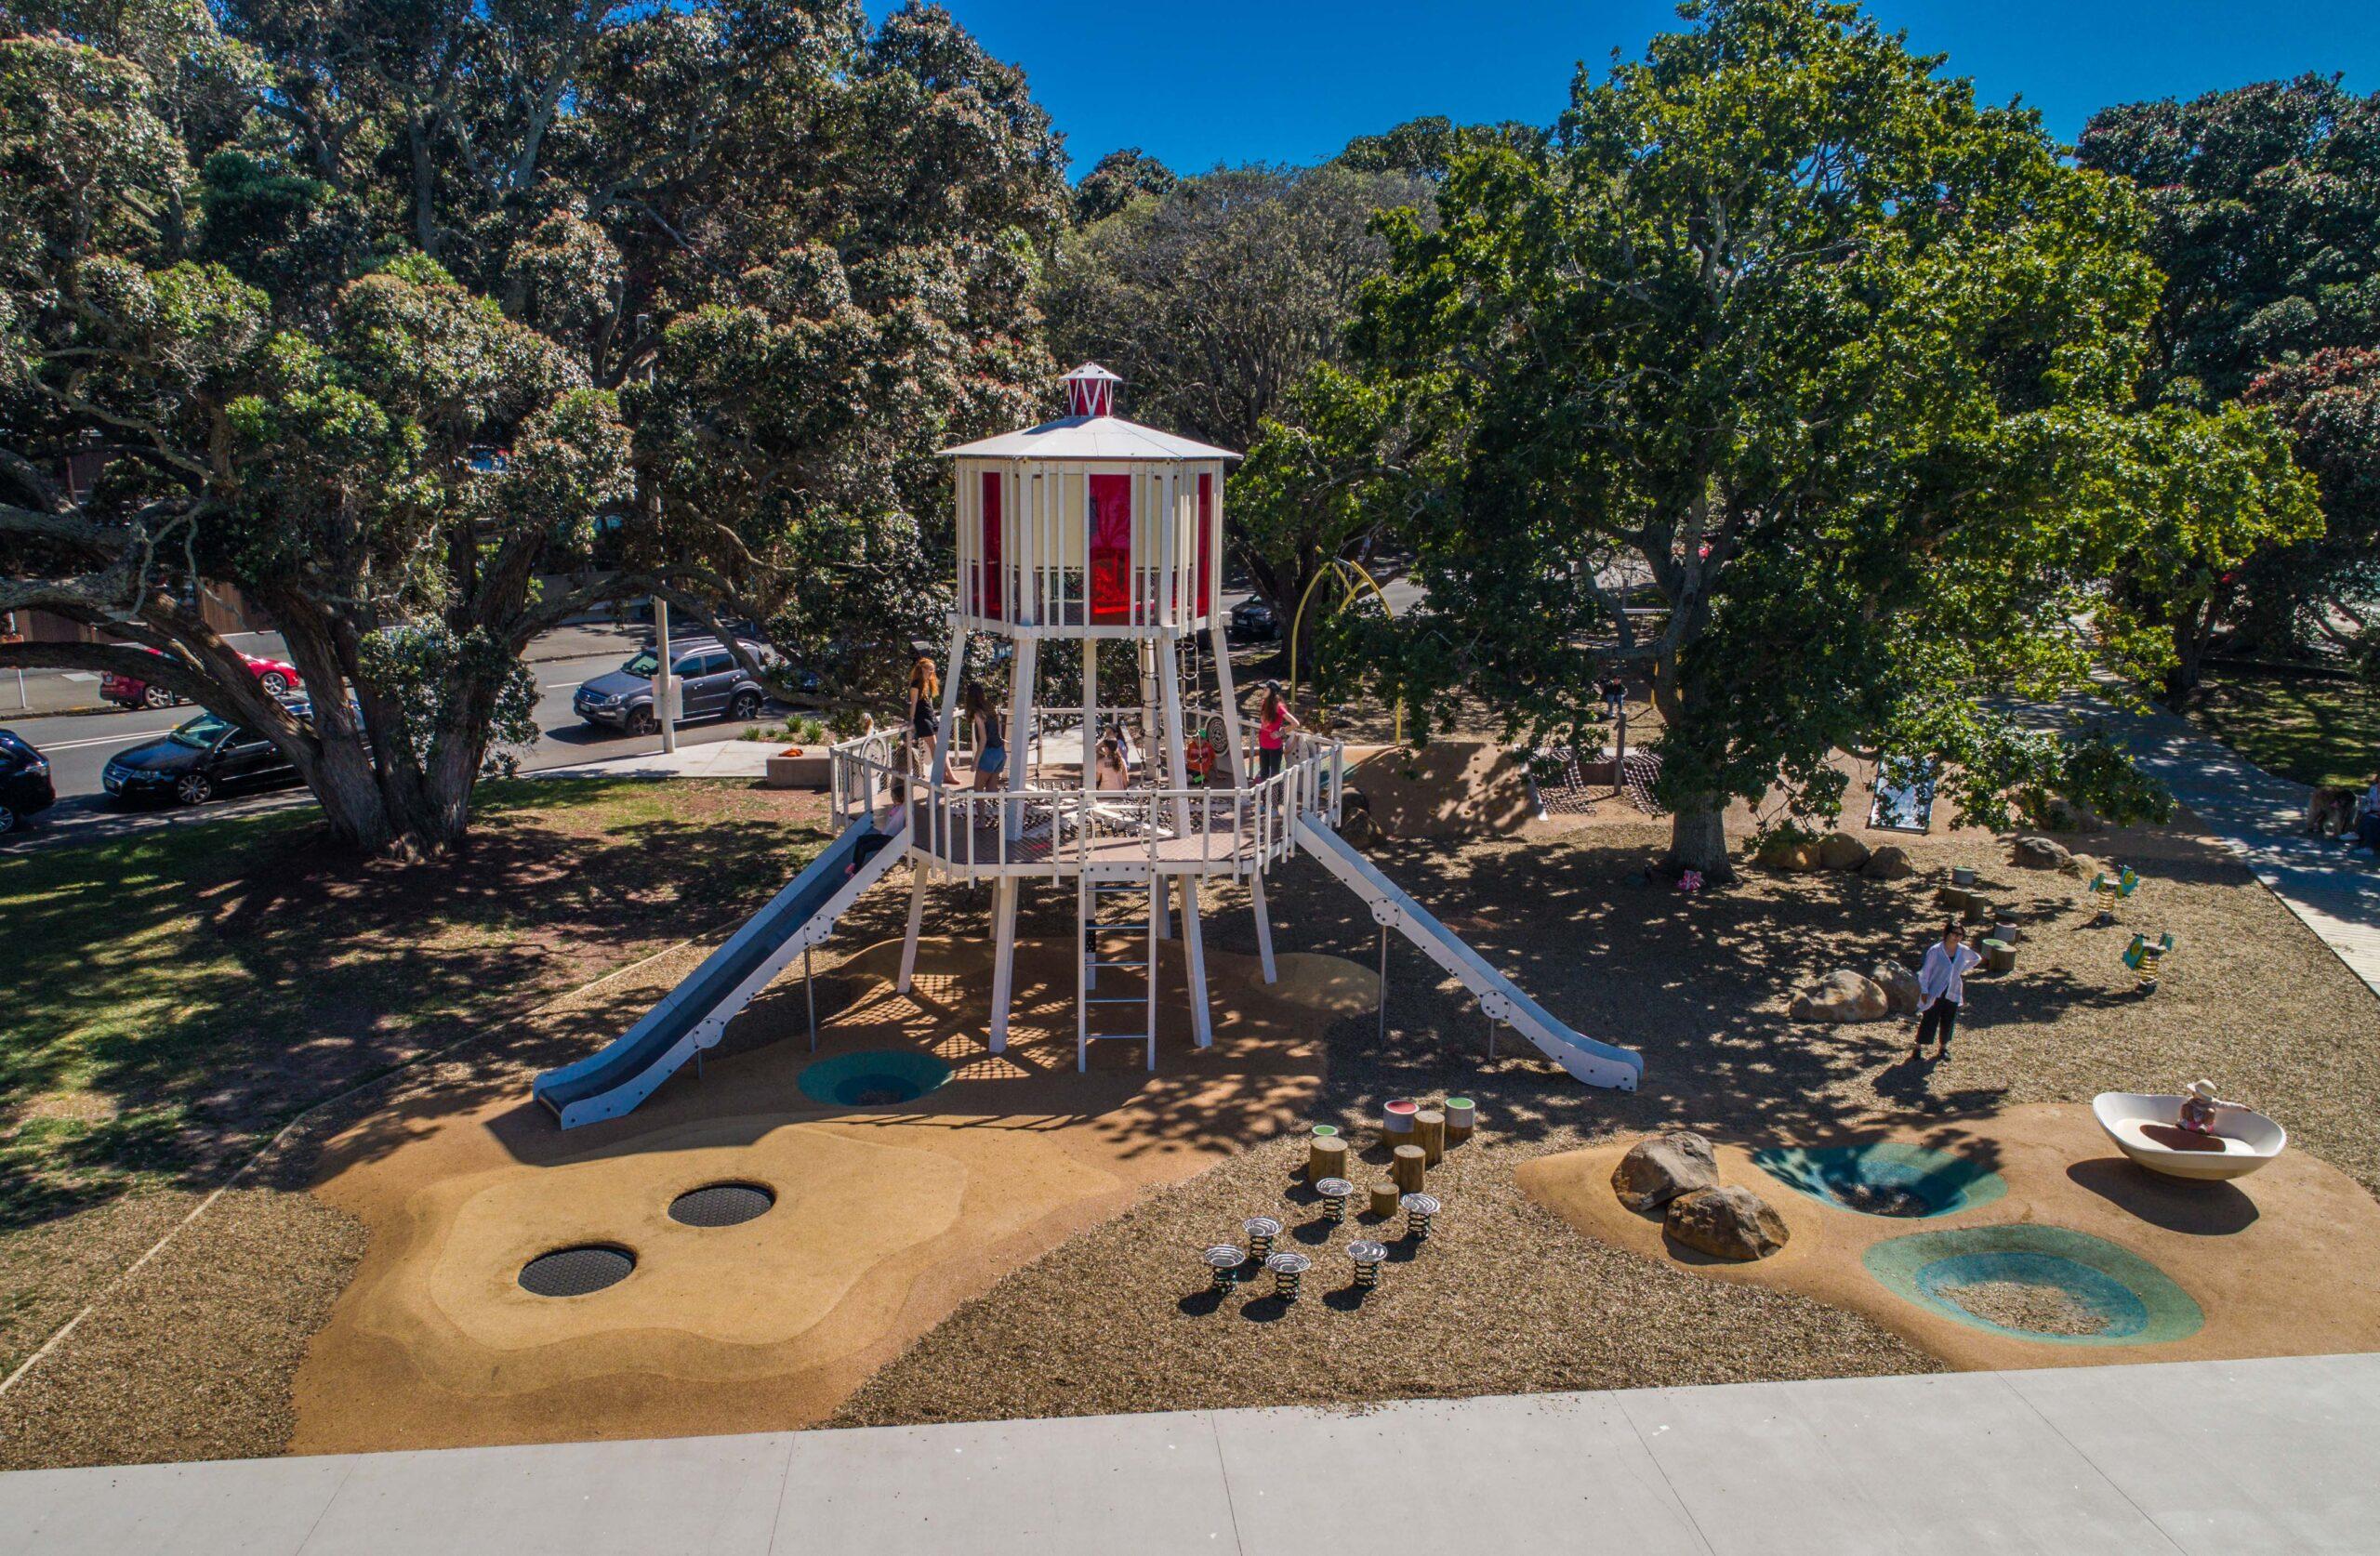 Windsor reserve playground